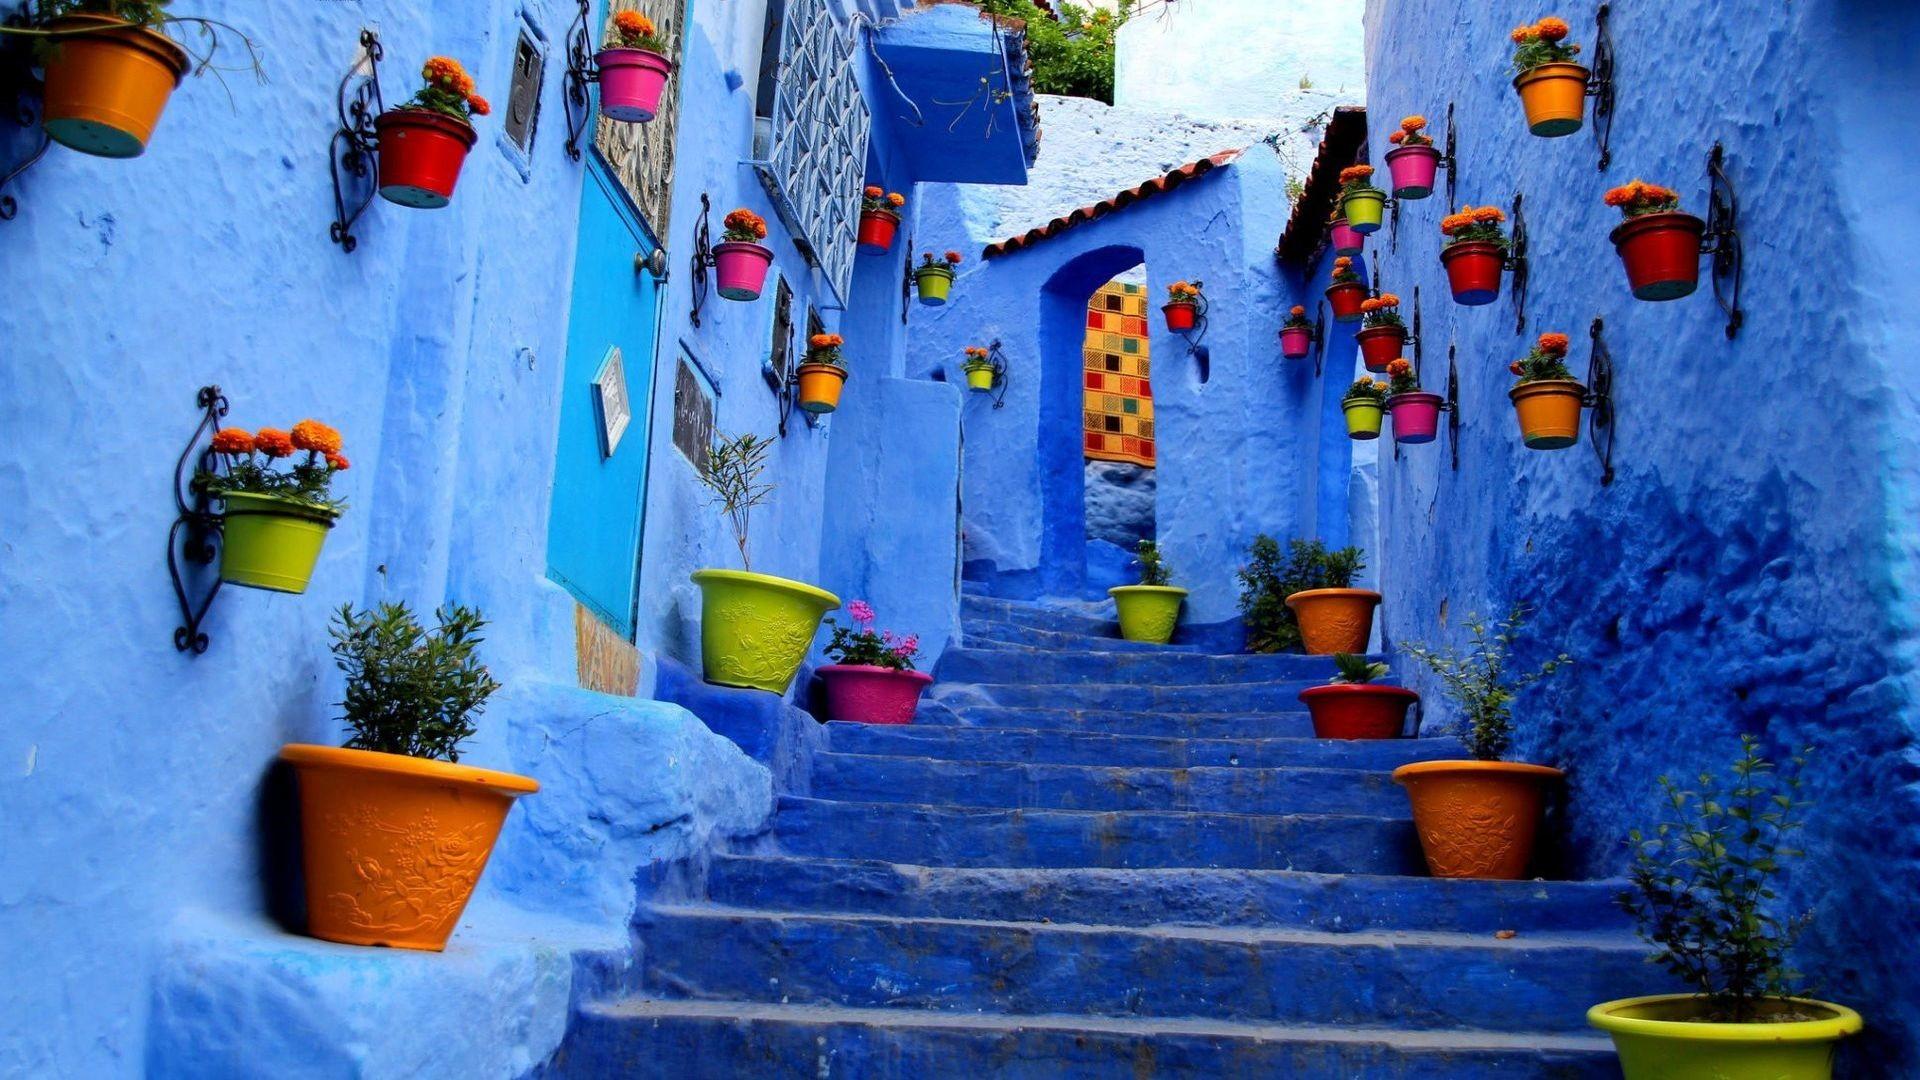 Res: 1920x1080, Wallpaper Pack - Blue City / Morocco (Rare)